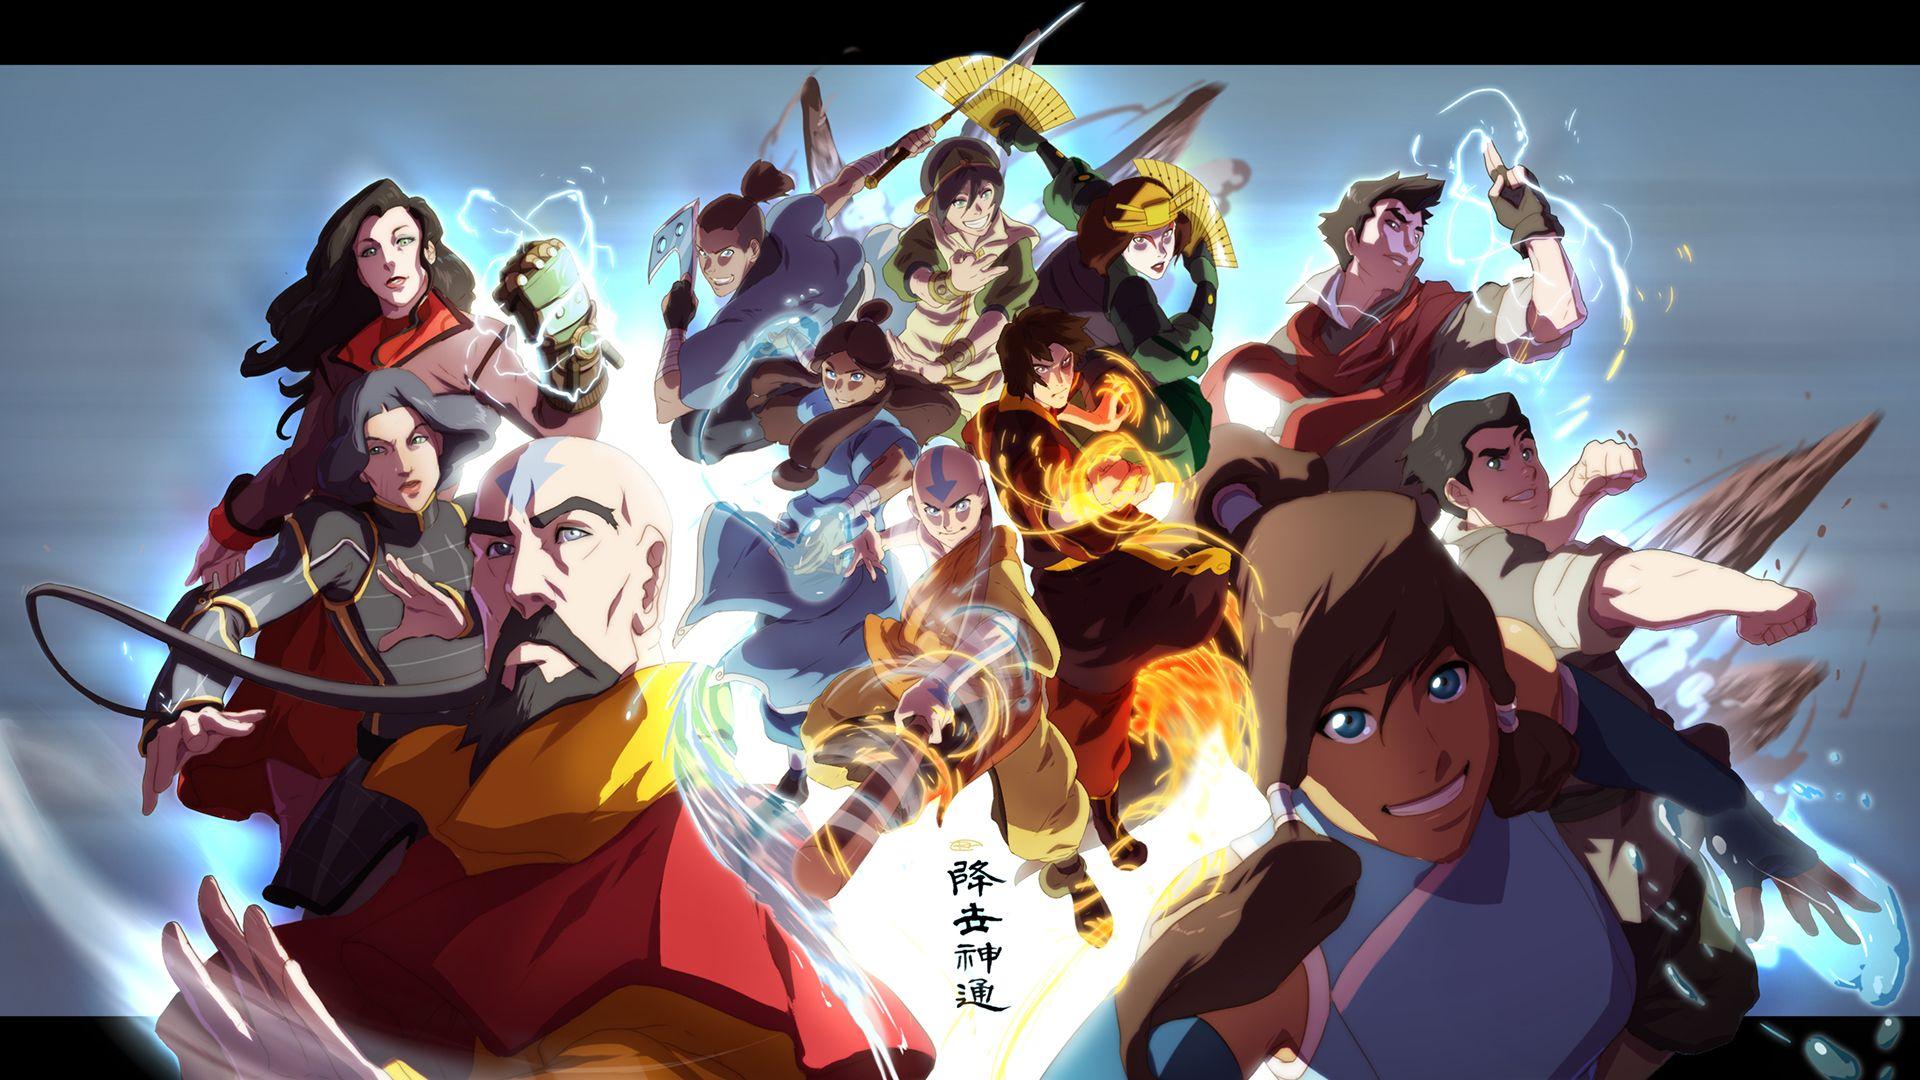 45322 Avatar The Last Airbender Jpg 1920 1080 Avatar Aang Avatar The Last Airbender Legend Of Korra